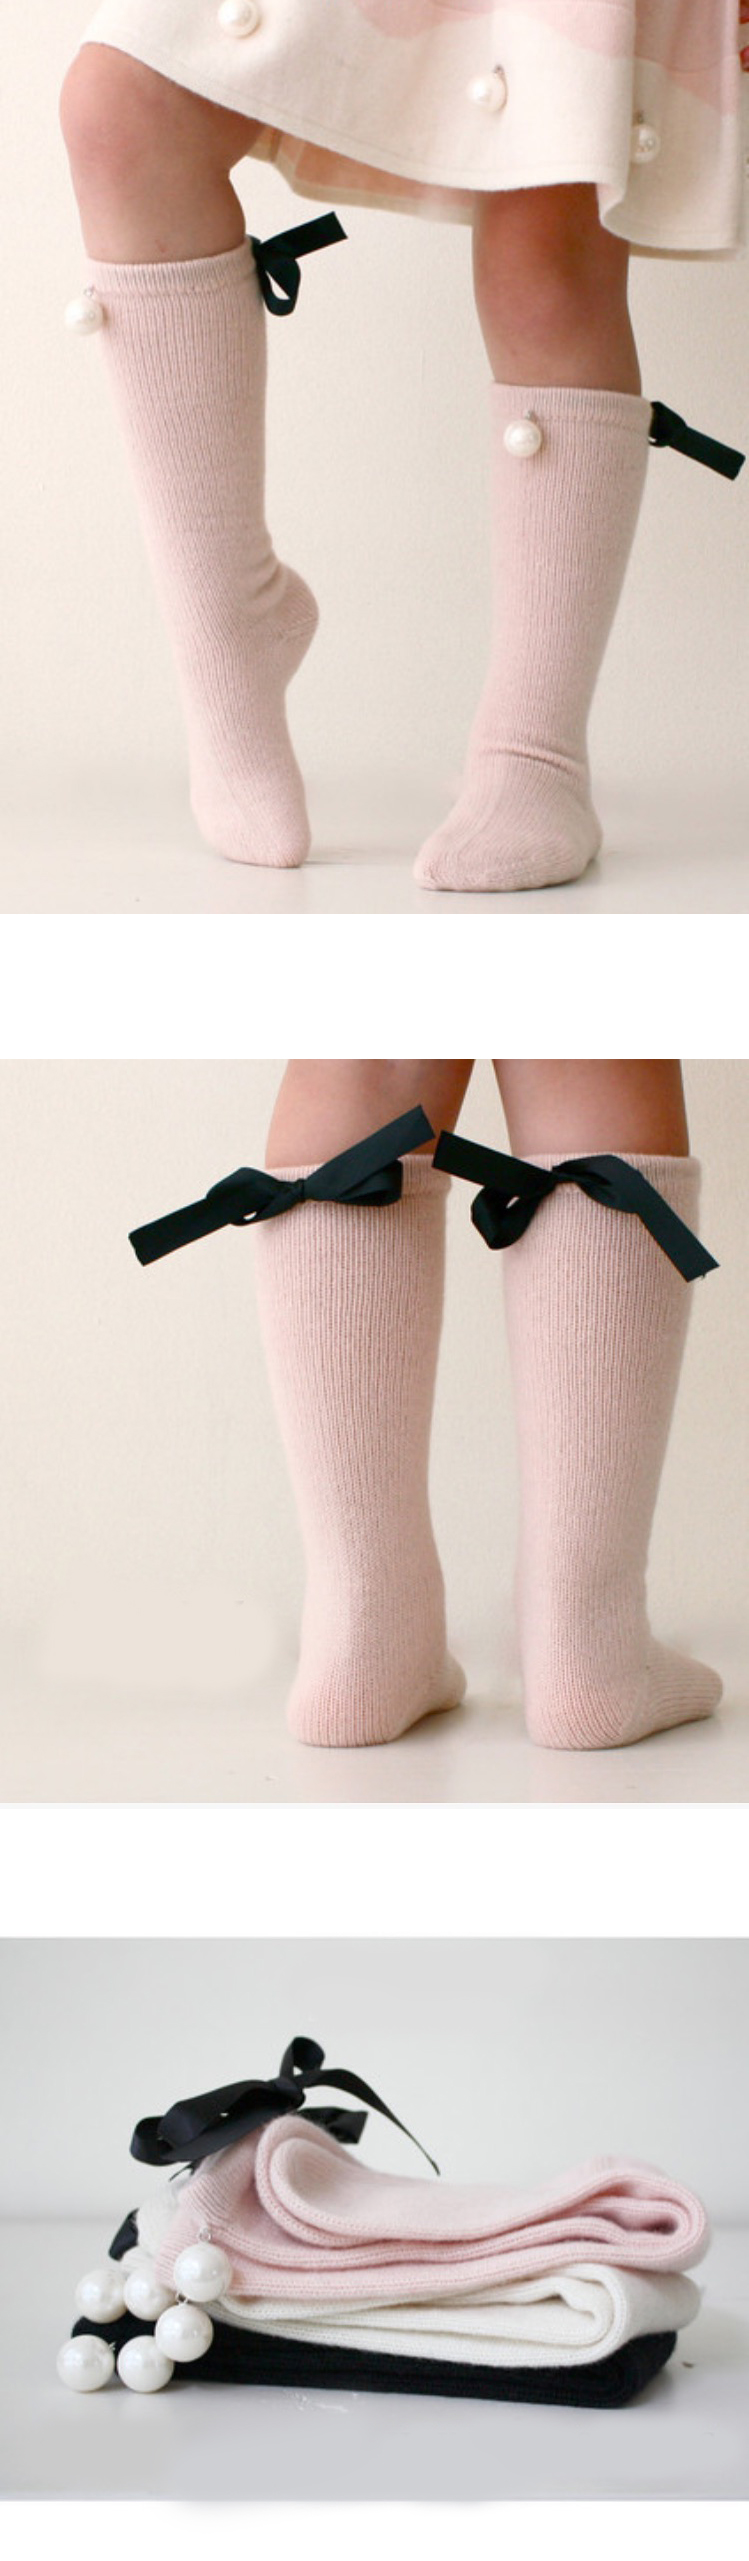 Winter Newborn Kids Baby Girl Socks Toddler Kids Knee High Long Socks Cotton Cute Bow Girls Socks Autumn 0-7 Years